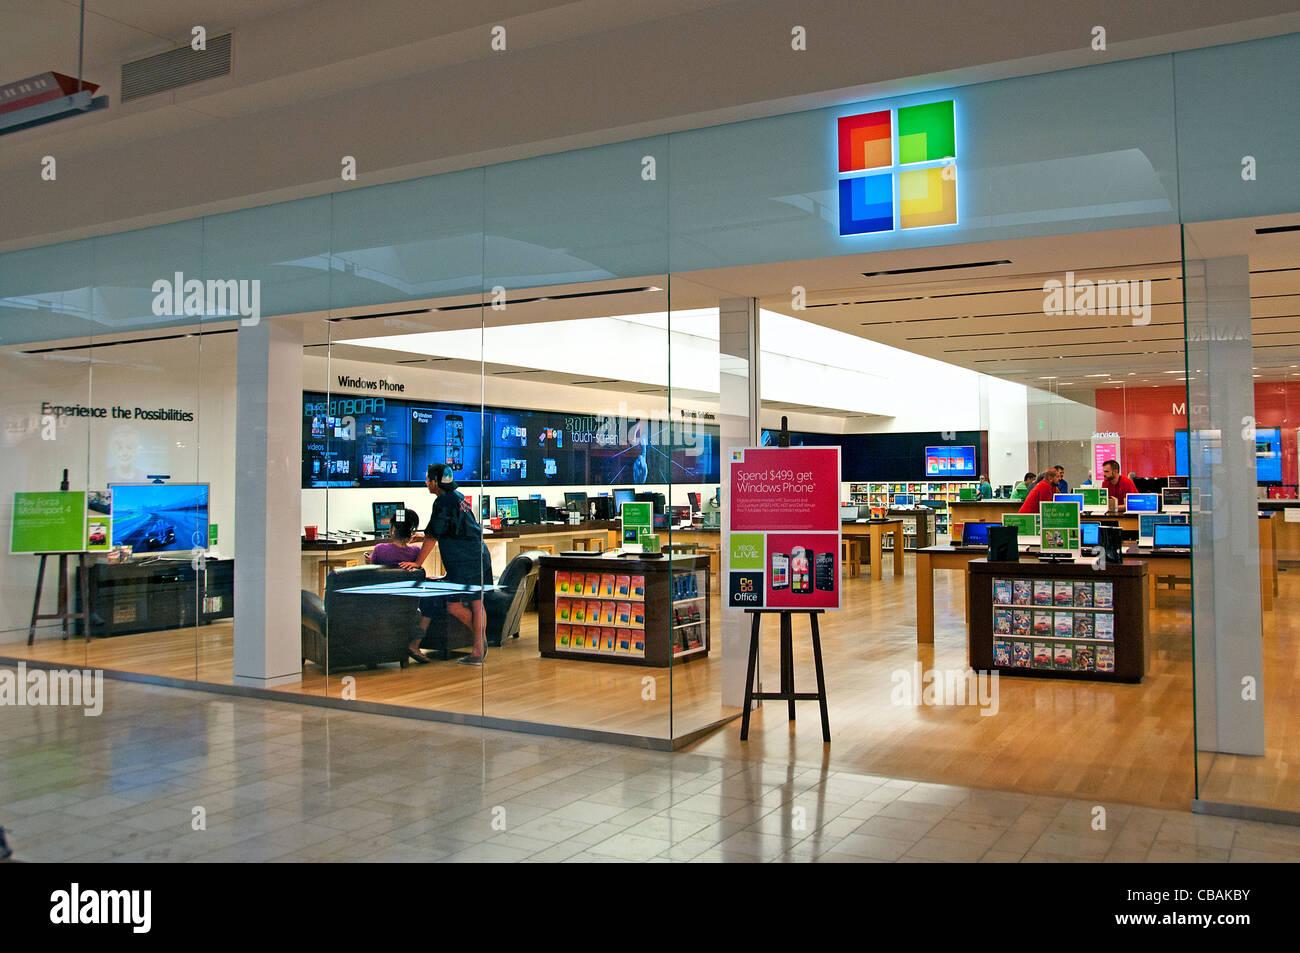 Windows Phone Microsoft Shopping Mall Shop Store Computer